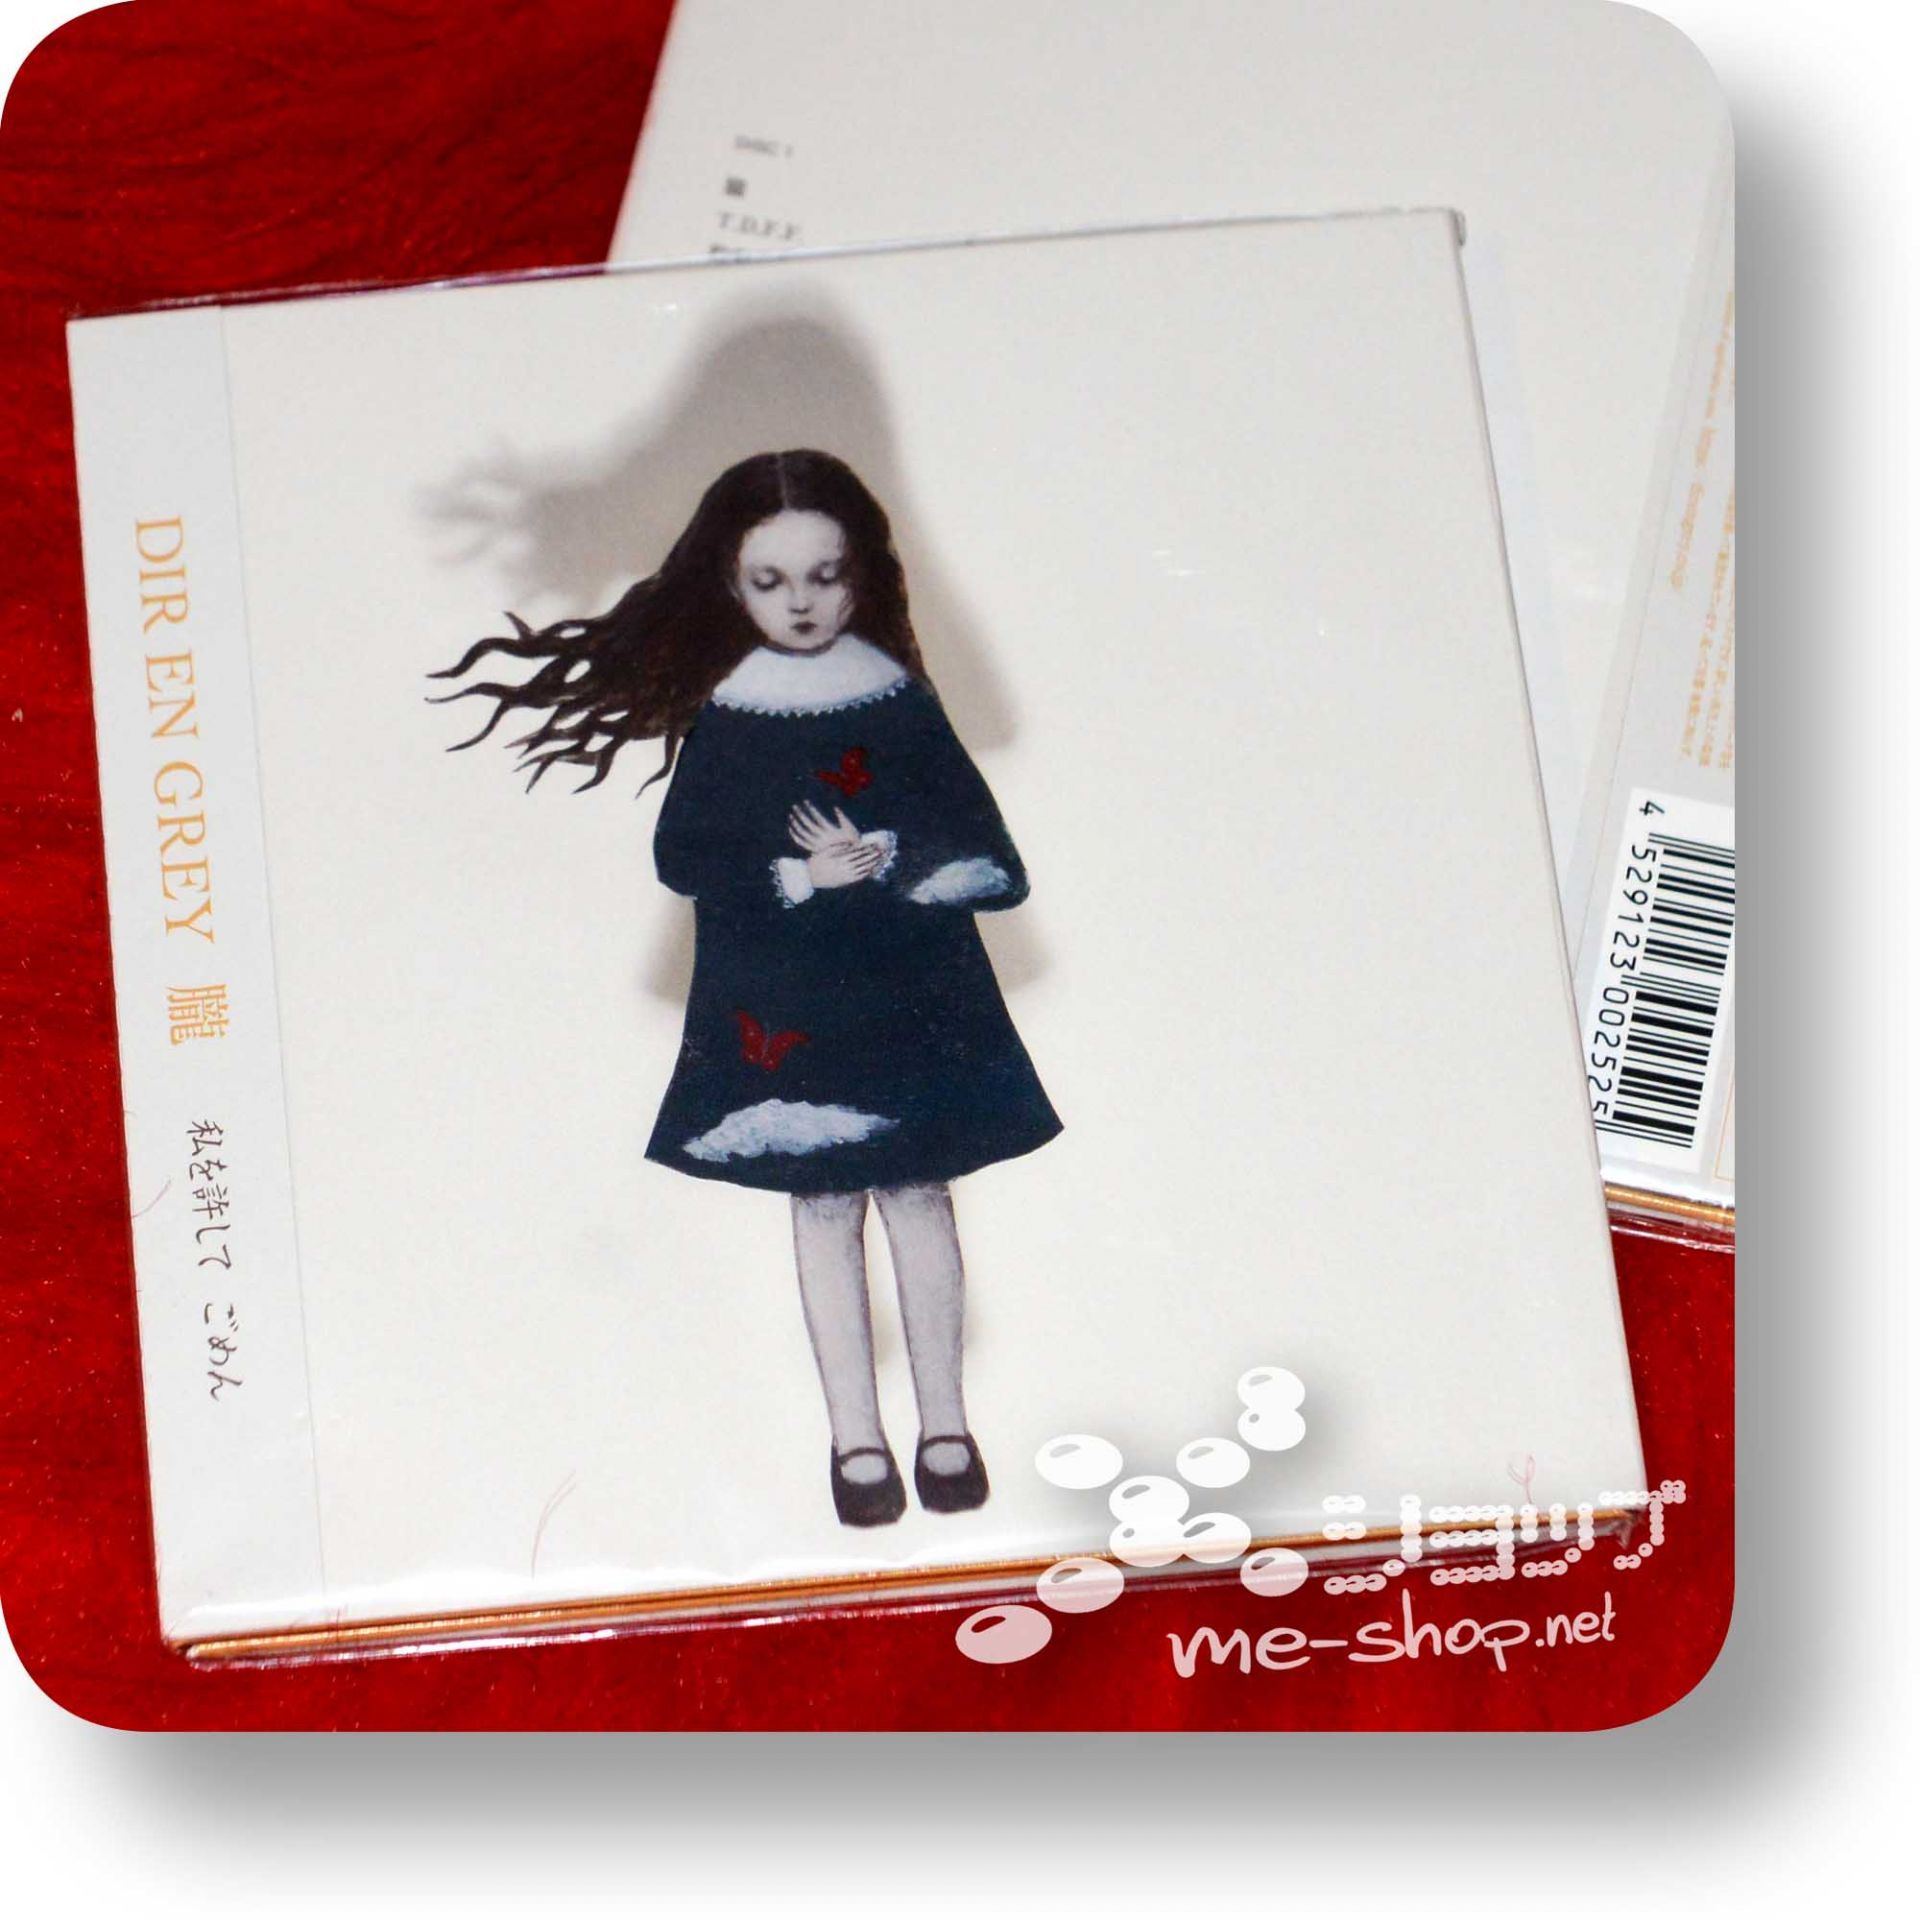 dir en grey oboro cd+dvd